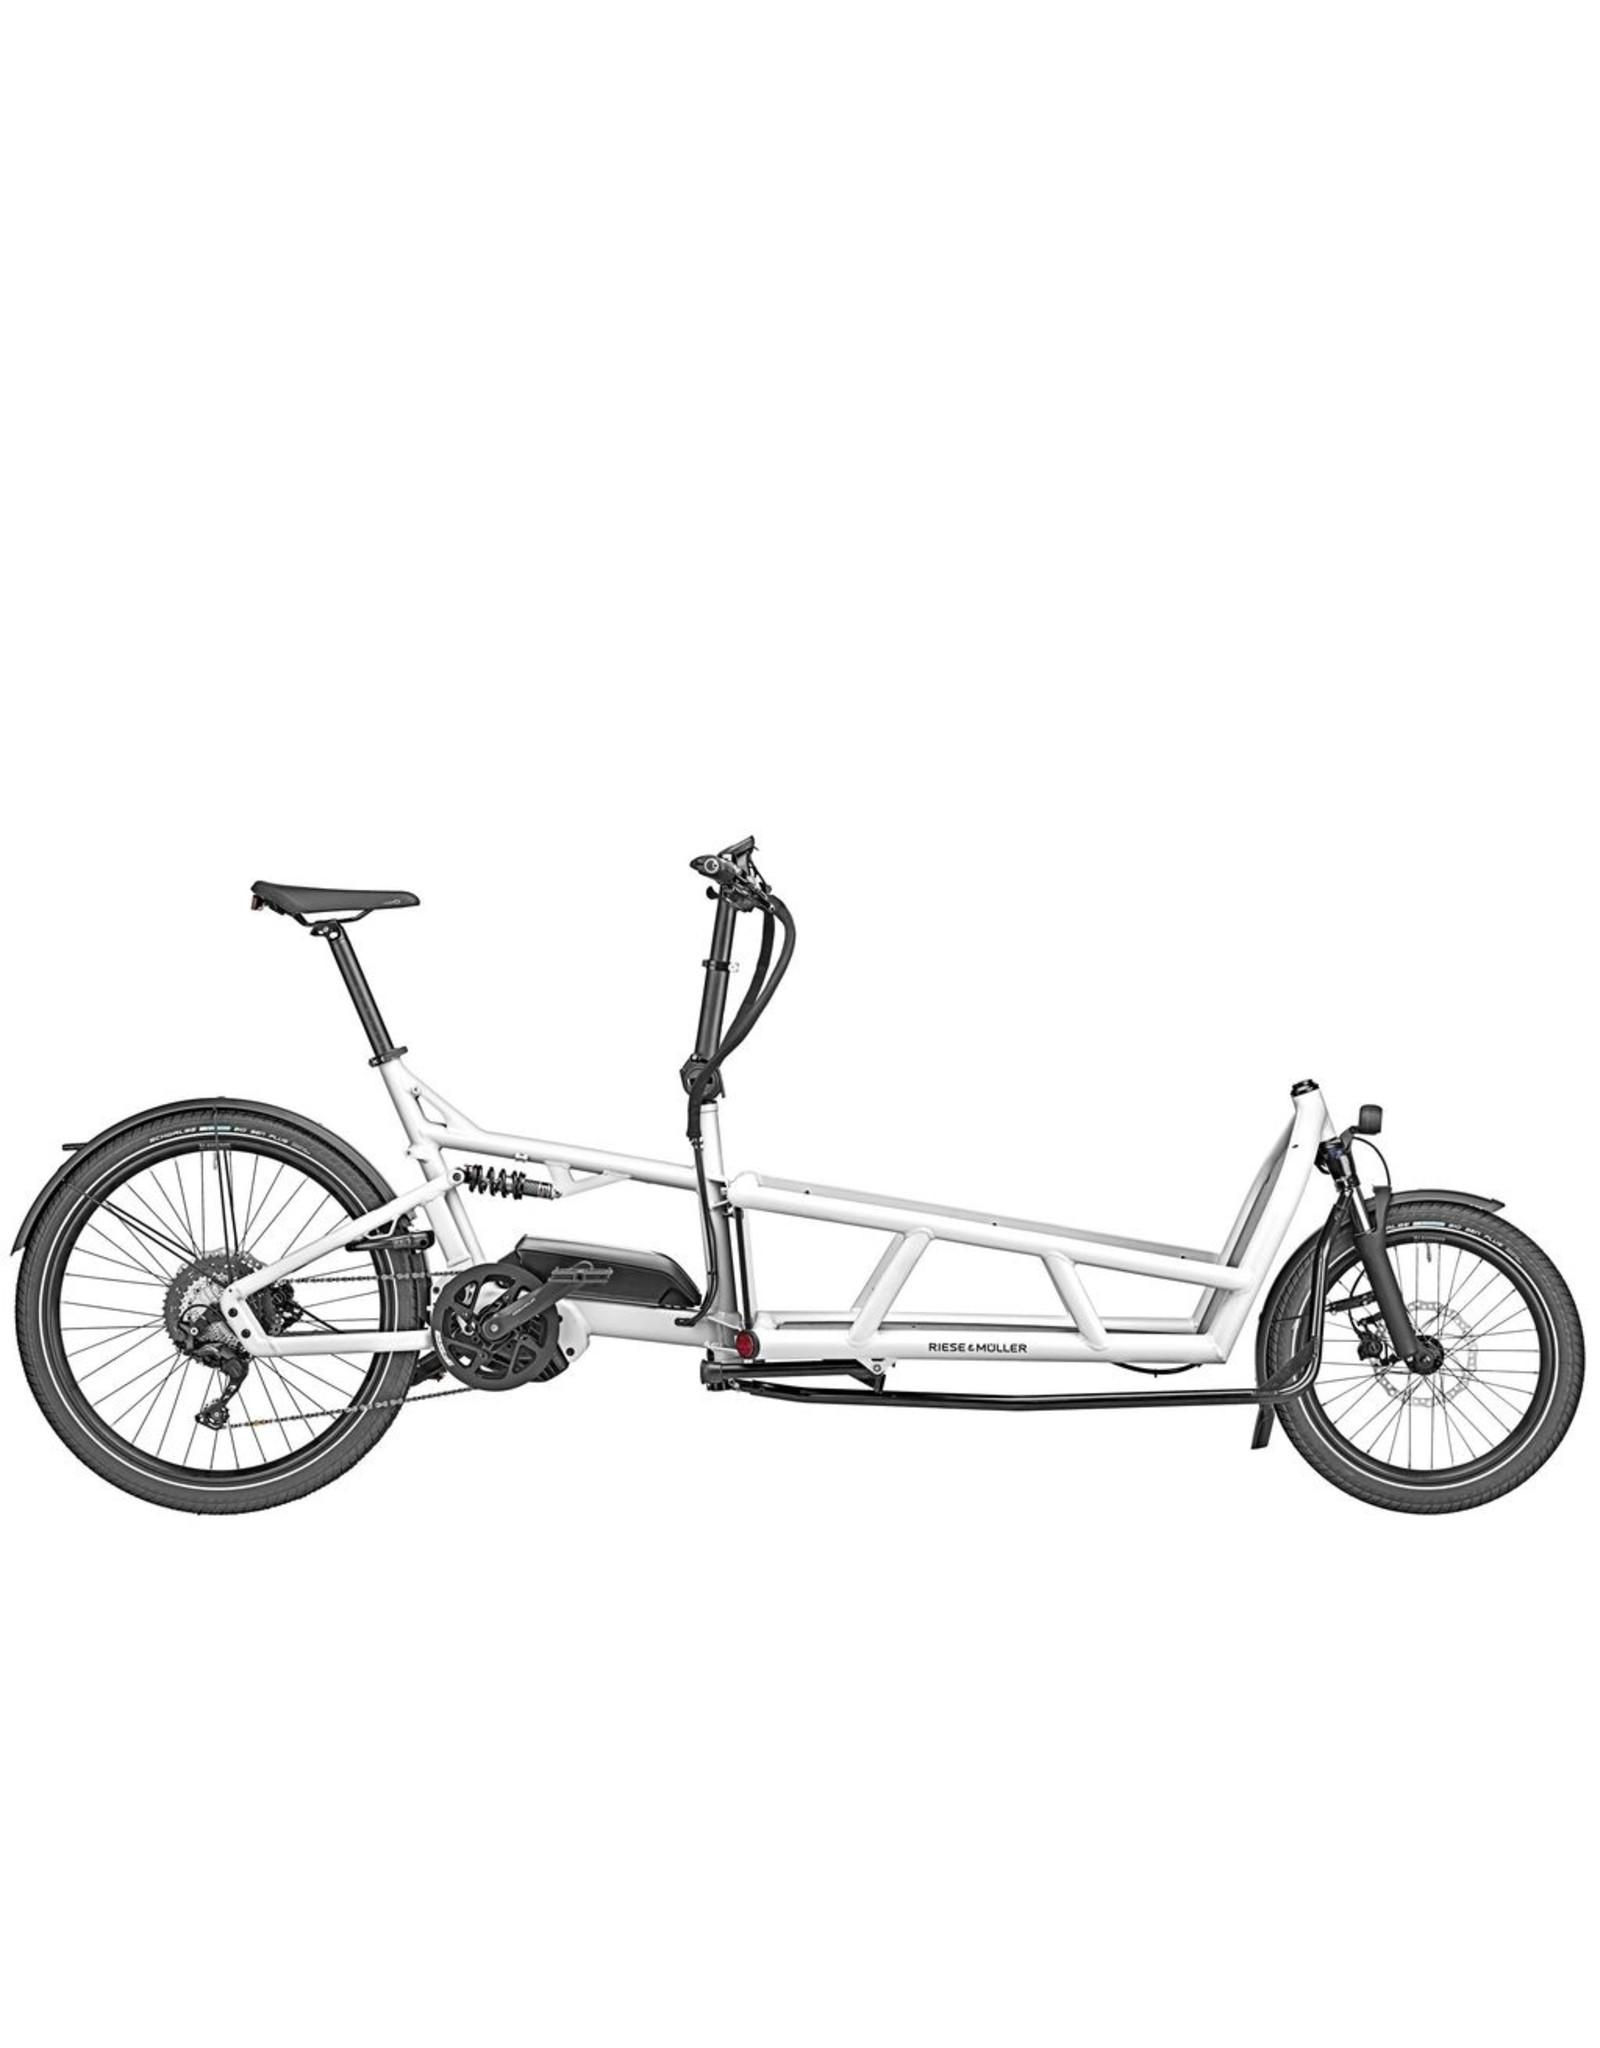 RIESE & MÜLLER RIESE & MULLER LOAD VARIO 75 cargo bike white